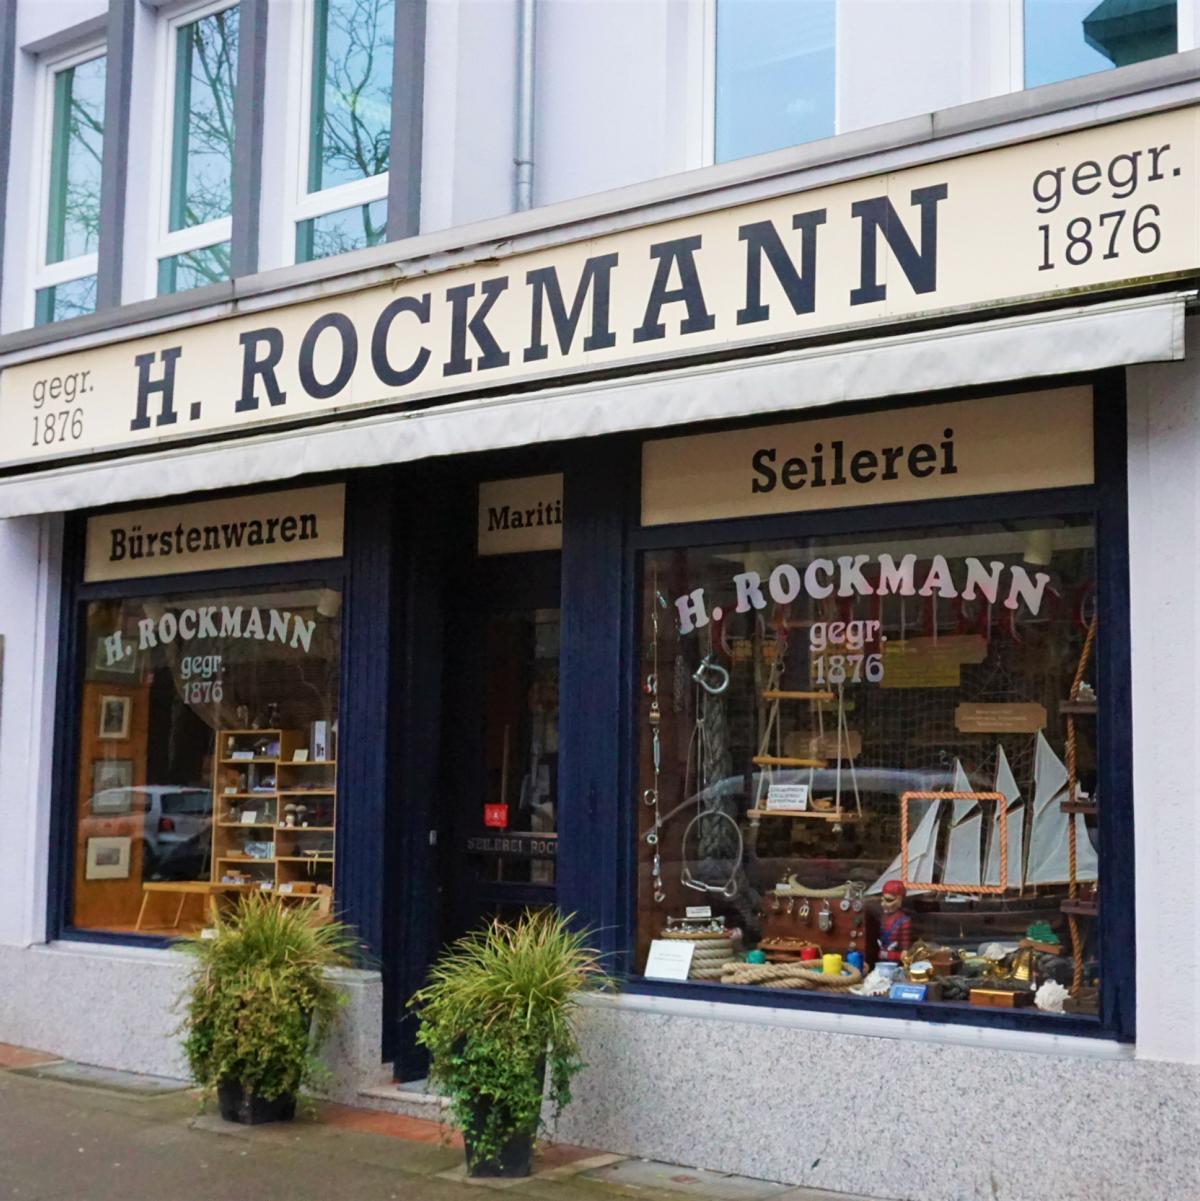 Style Hannover Seilerei Rockmann B1 - Seilerei H. Rockmann: Kompetenz seit 1876